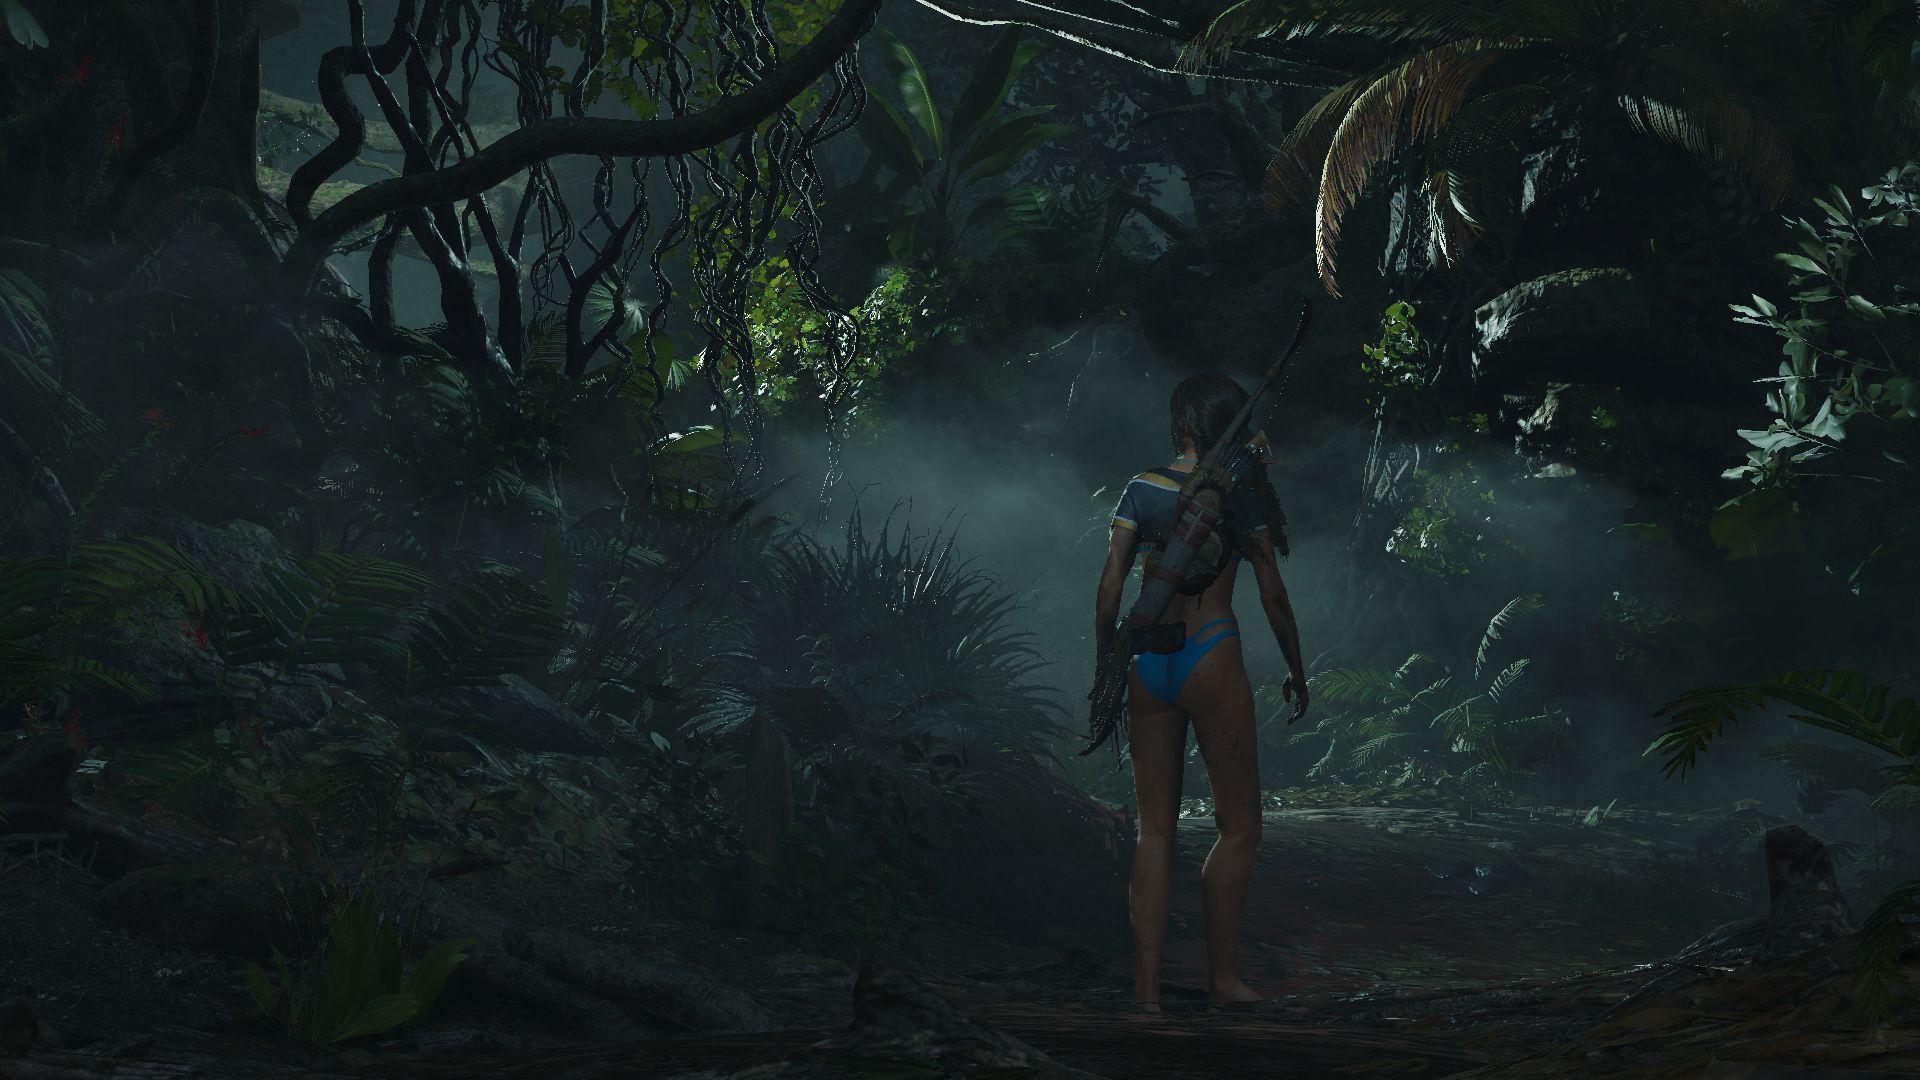 000672.Jpg - Shadow of the Tomb Raider